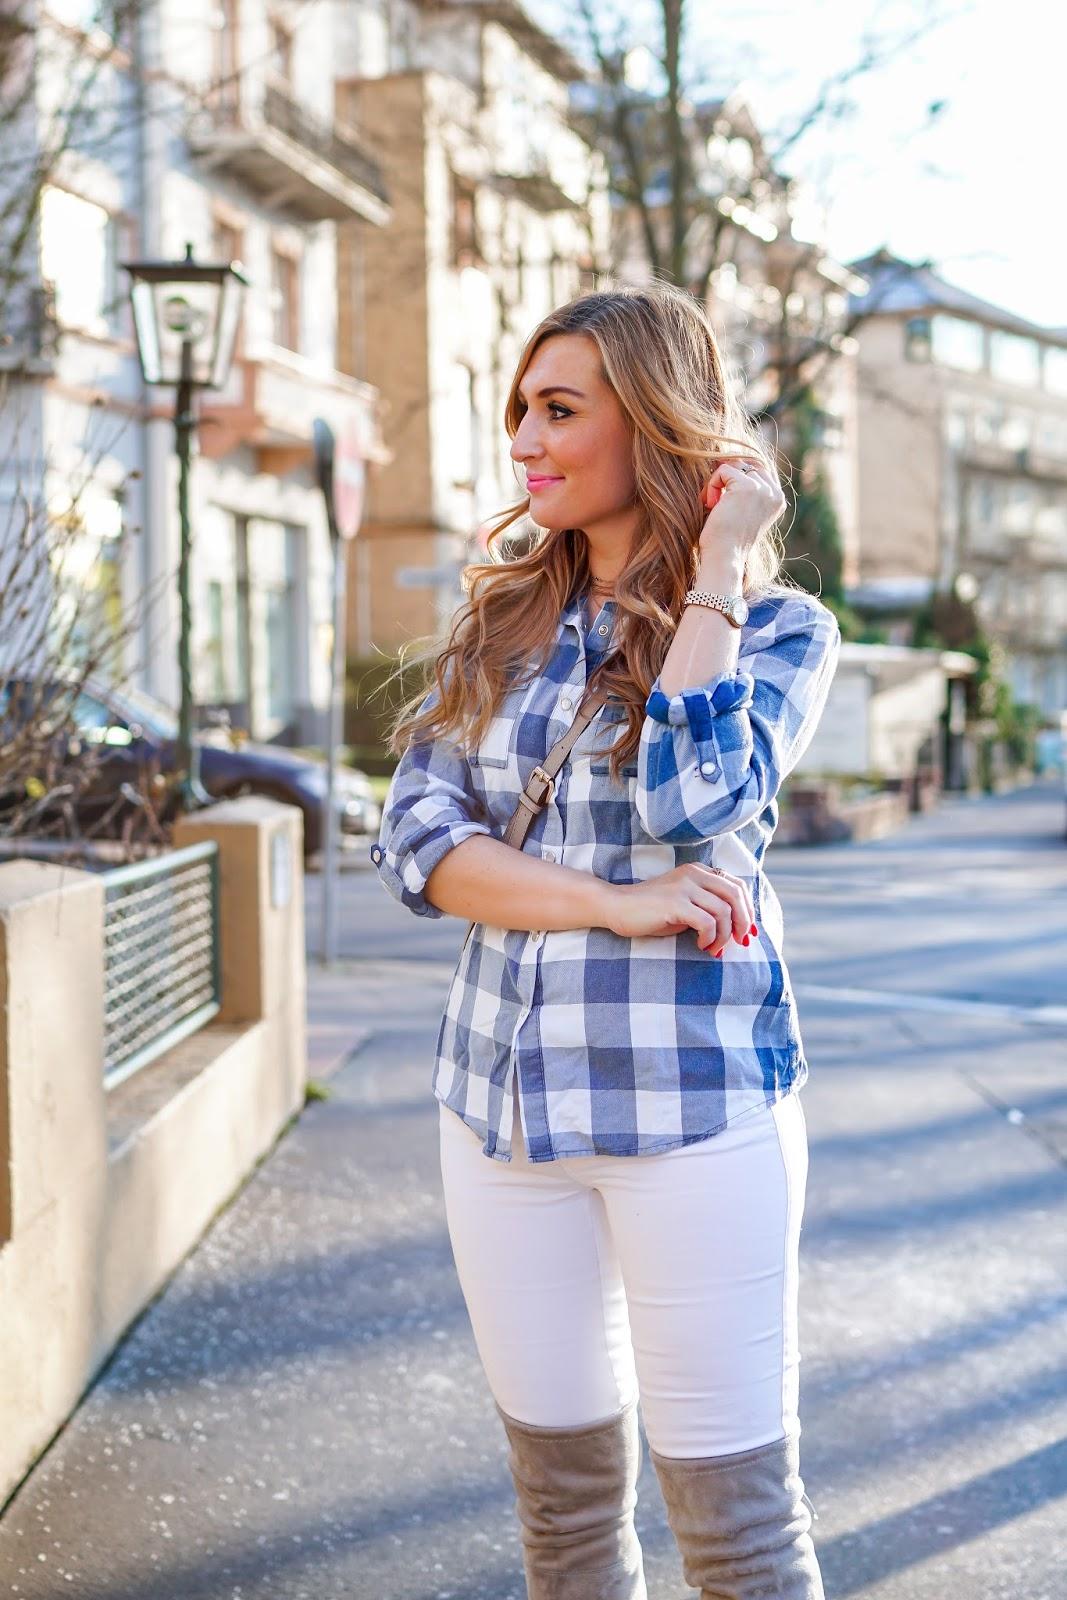 graue-overknees-stuart-weitzman-overknees-weiße-jeans-overknees-kombinieren-fashionstylebyjohanna